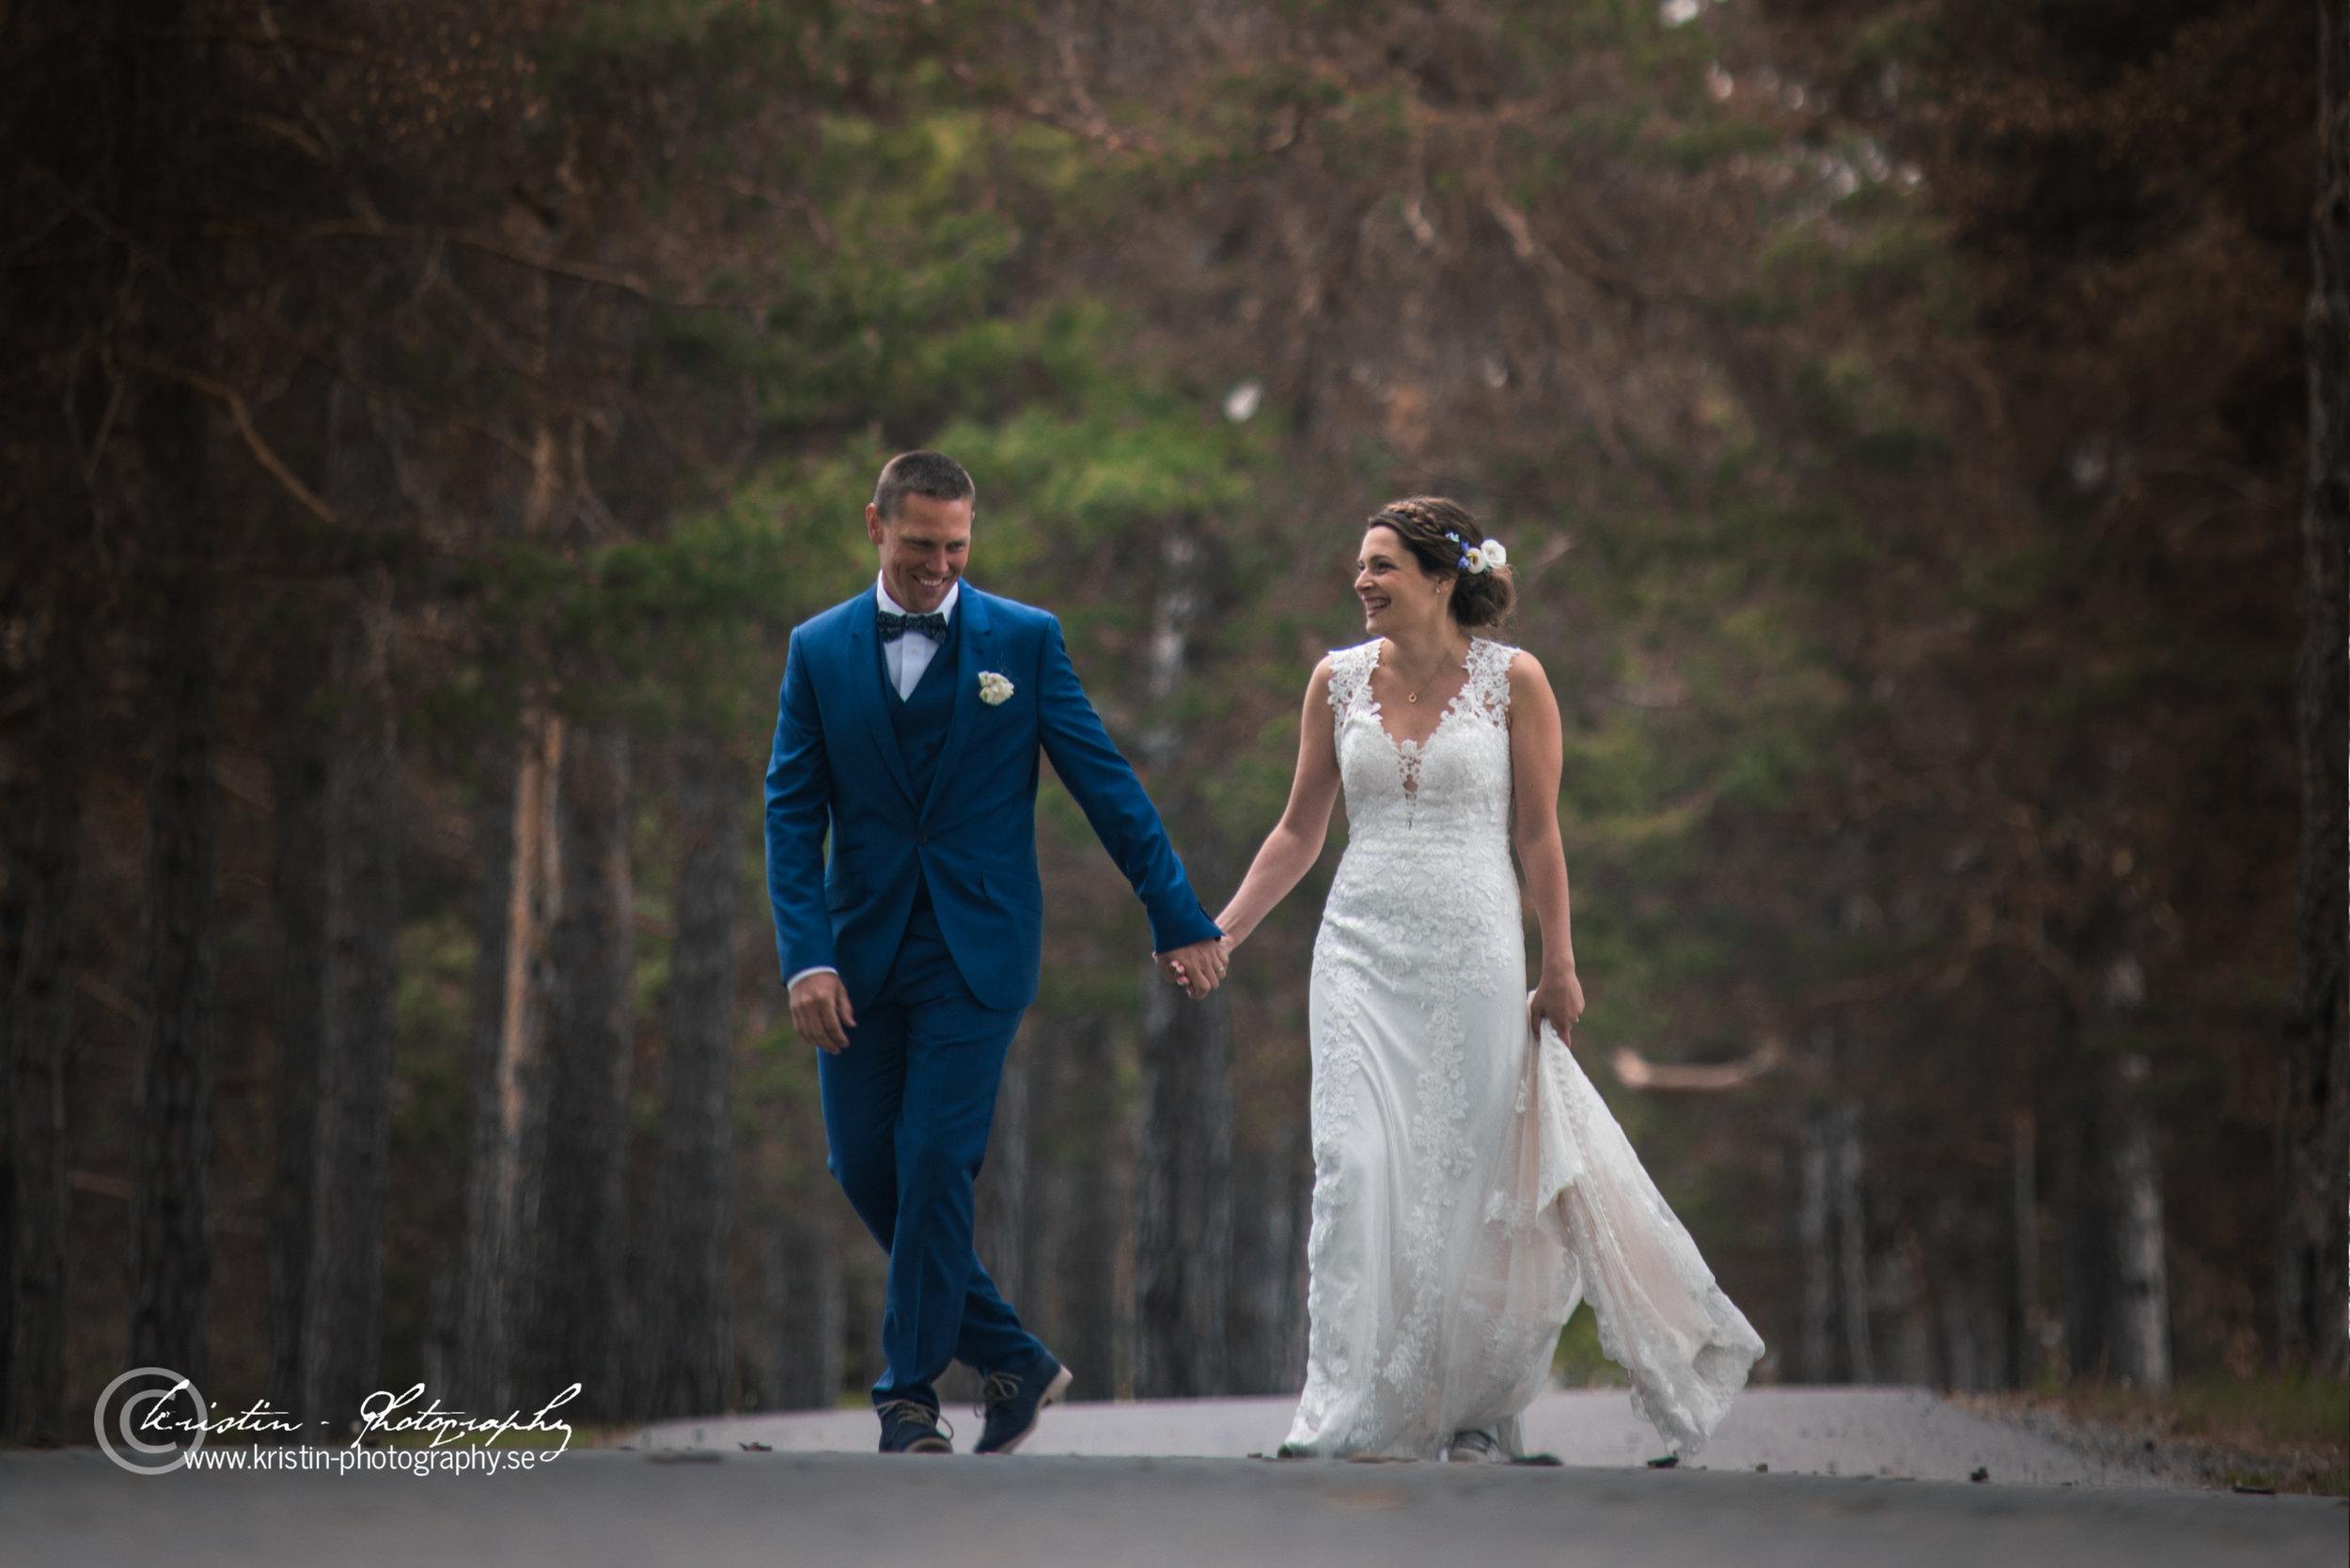 Rebecca & Mattias - Sundbyholm